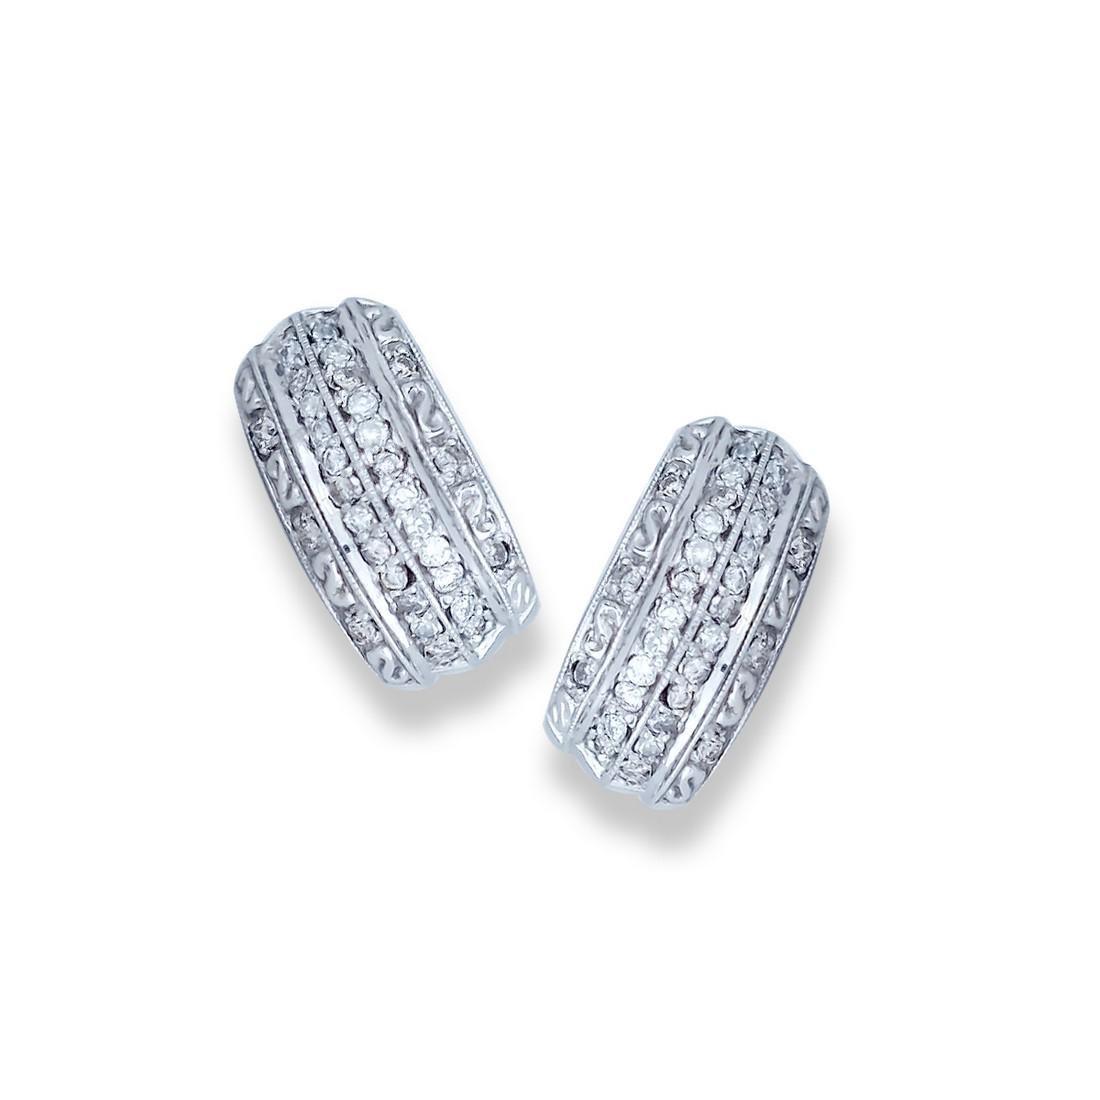 Four-Row, 1.20 TCW. Pave Diamond White Gold, Earrings